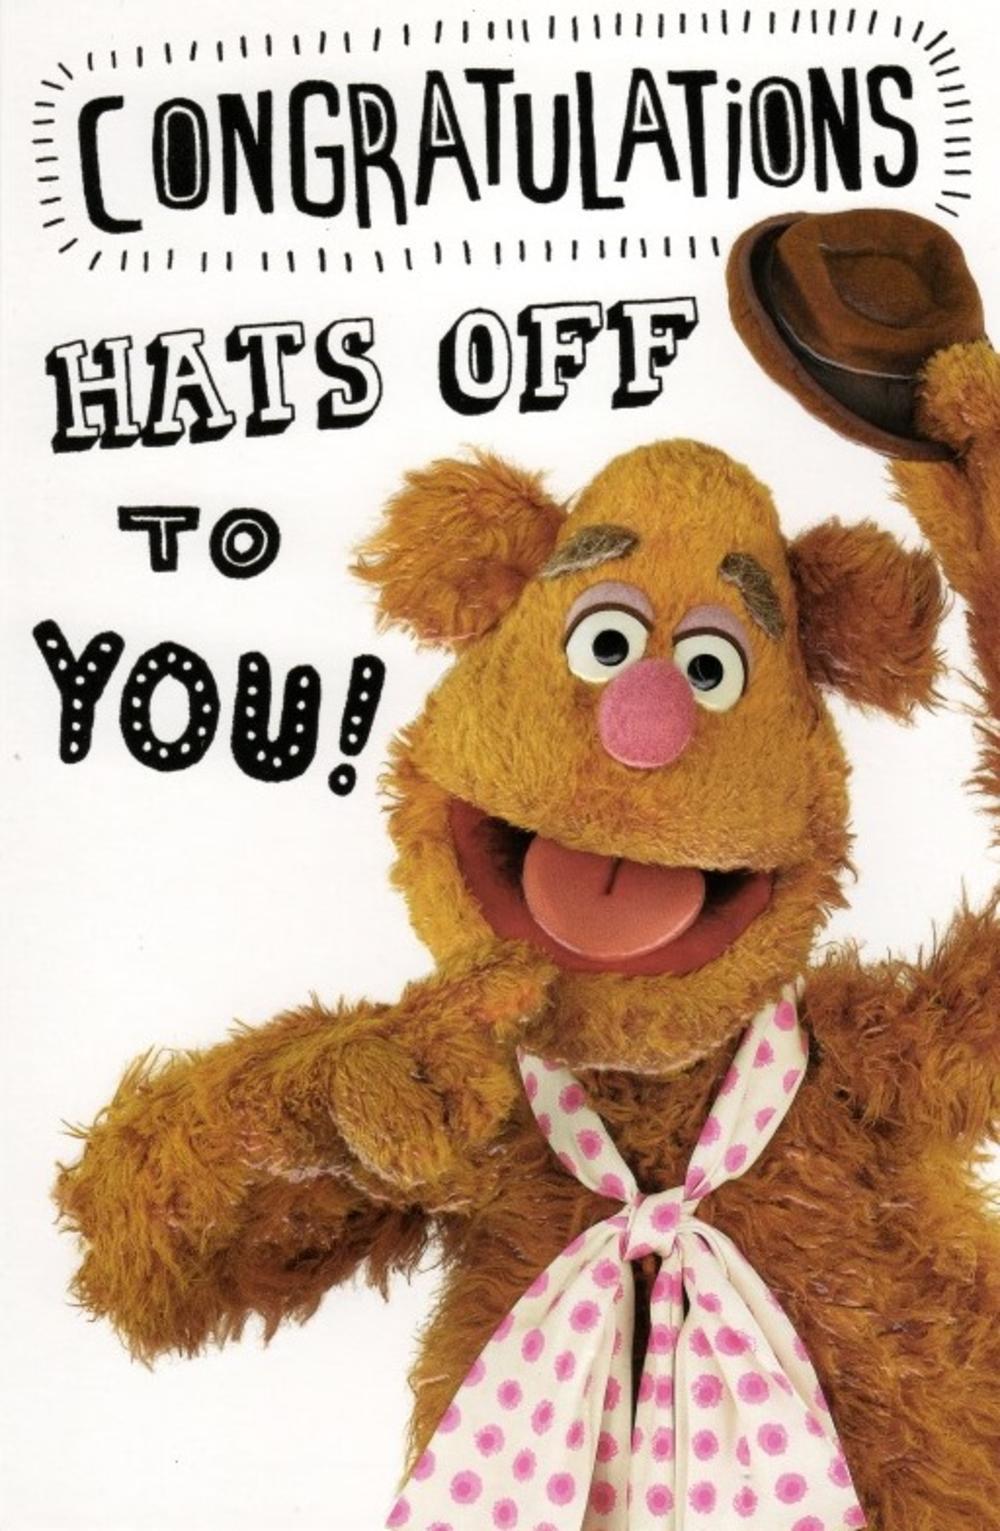 Fozzie Bear Hats Off Congratulations Card